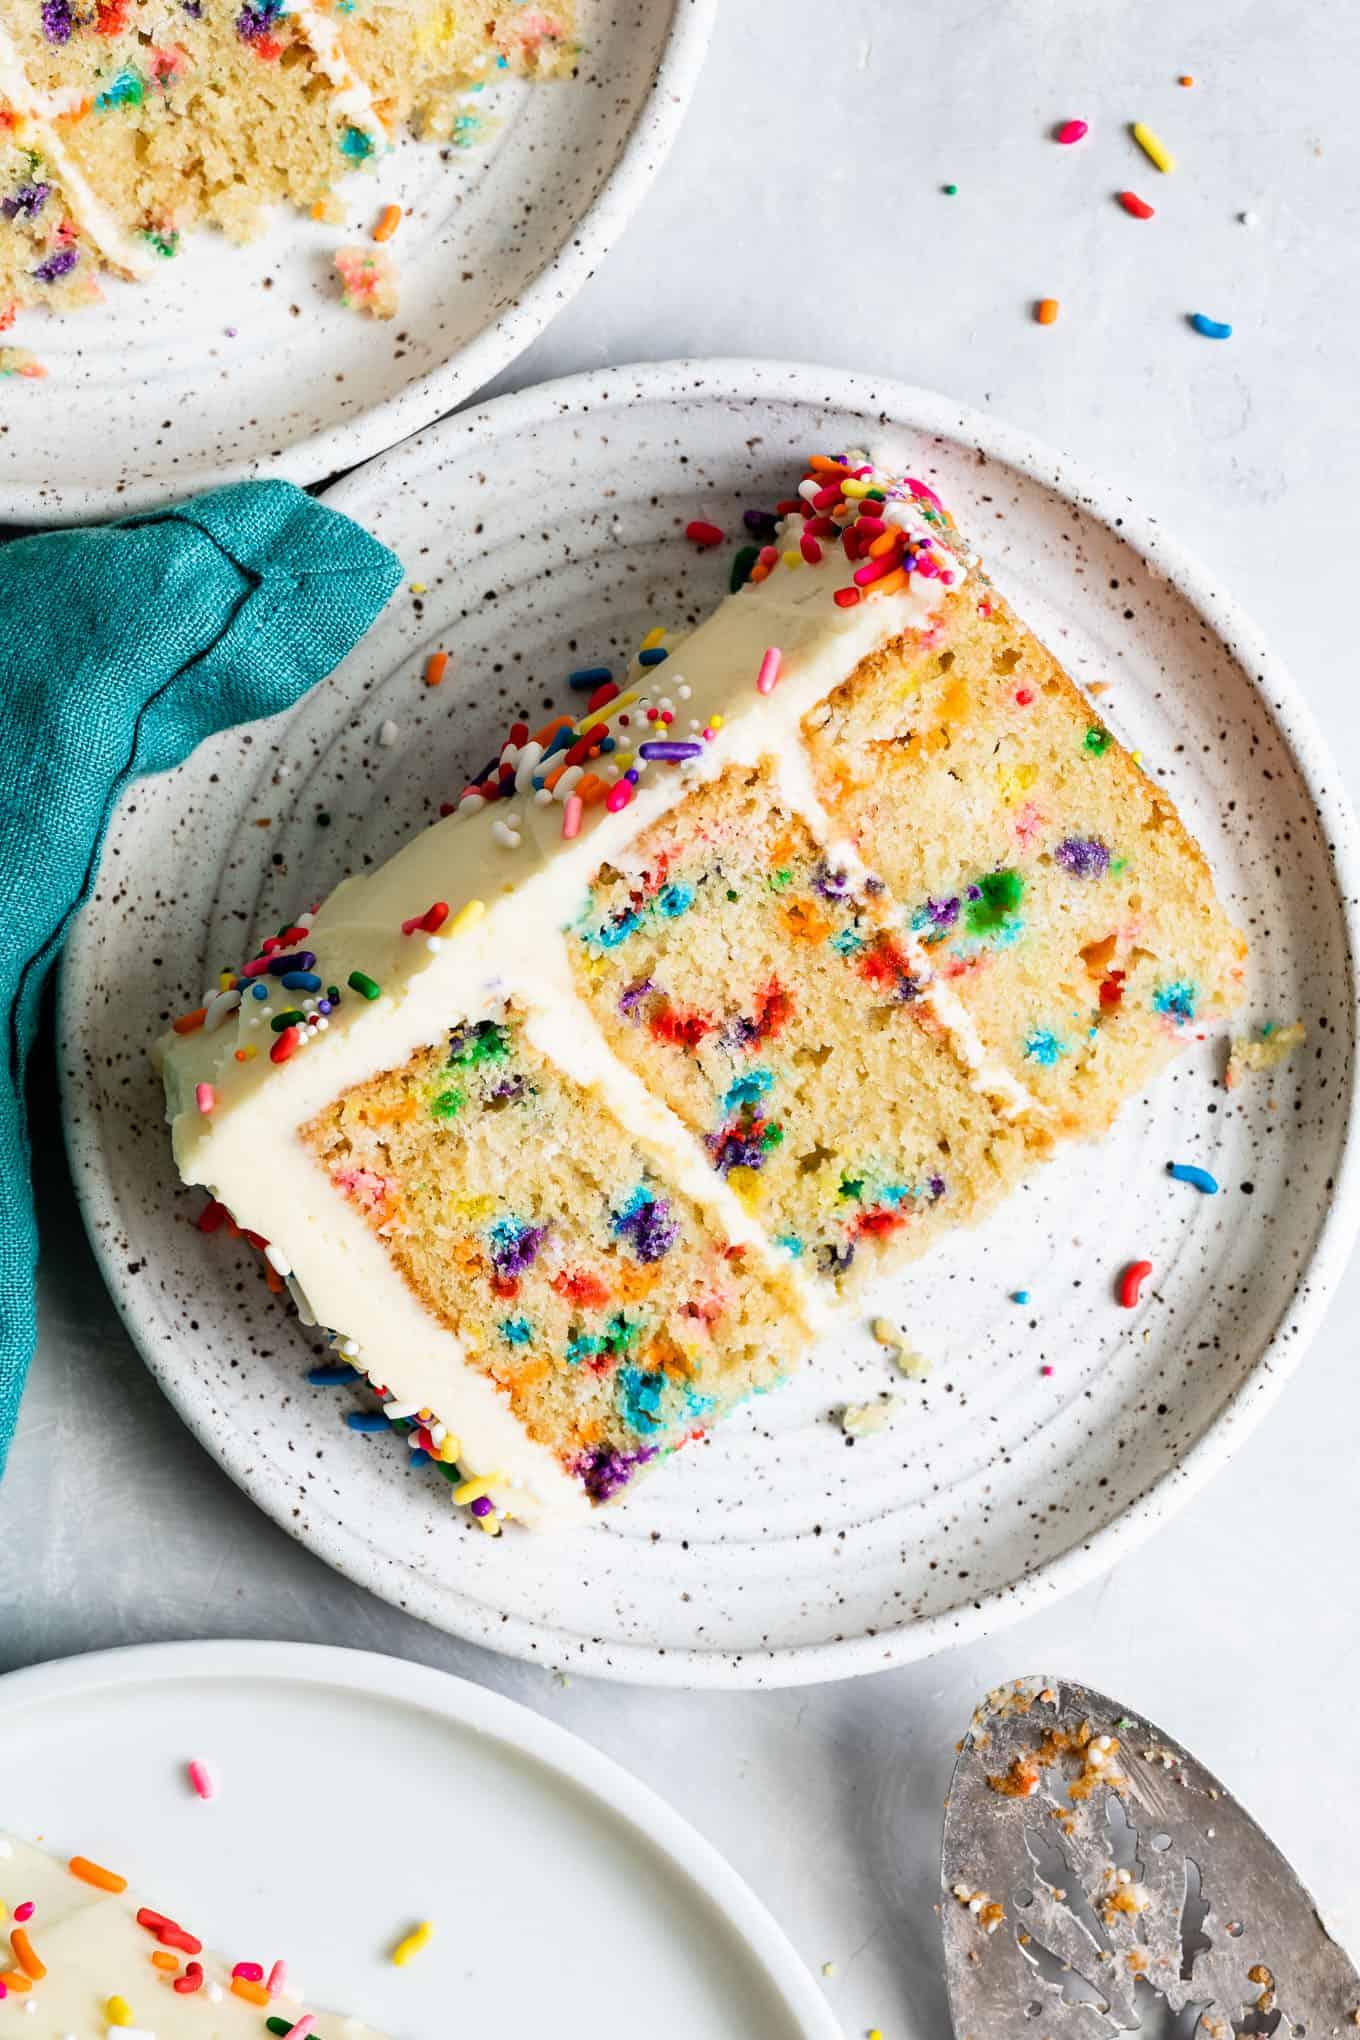 Slice of Gluten-Free Funfetti Birthday Cake